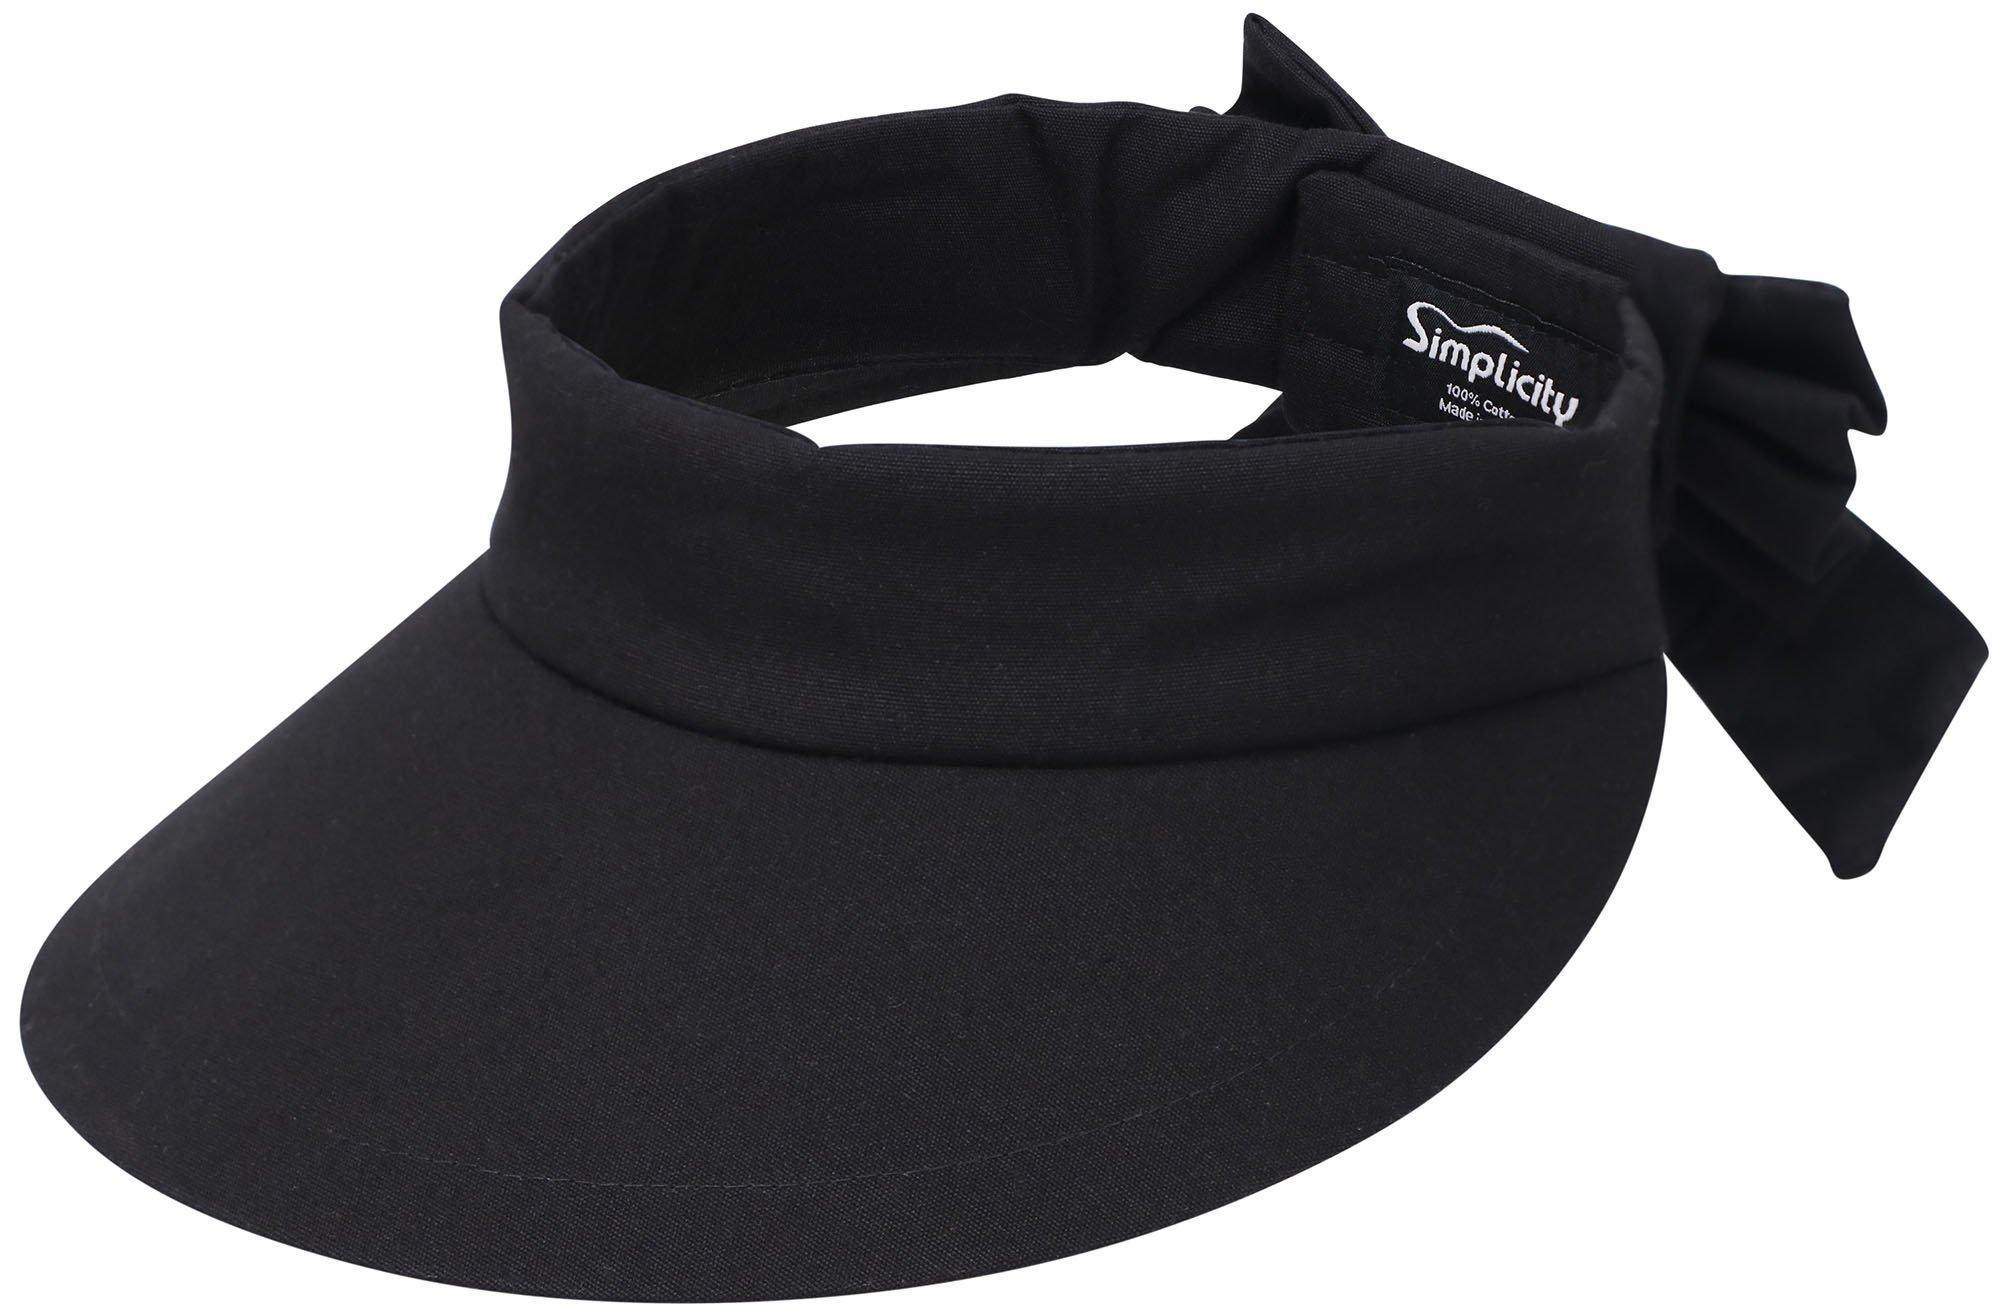 Simplicity Women's SPF 50+ UV Protection Wide Brim Beach Sun Visor Hat,Black